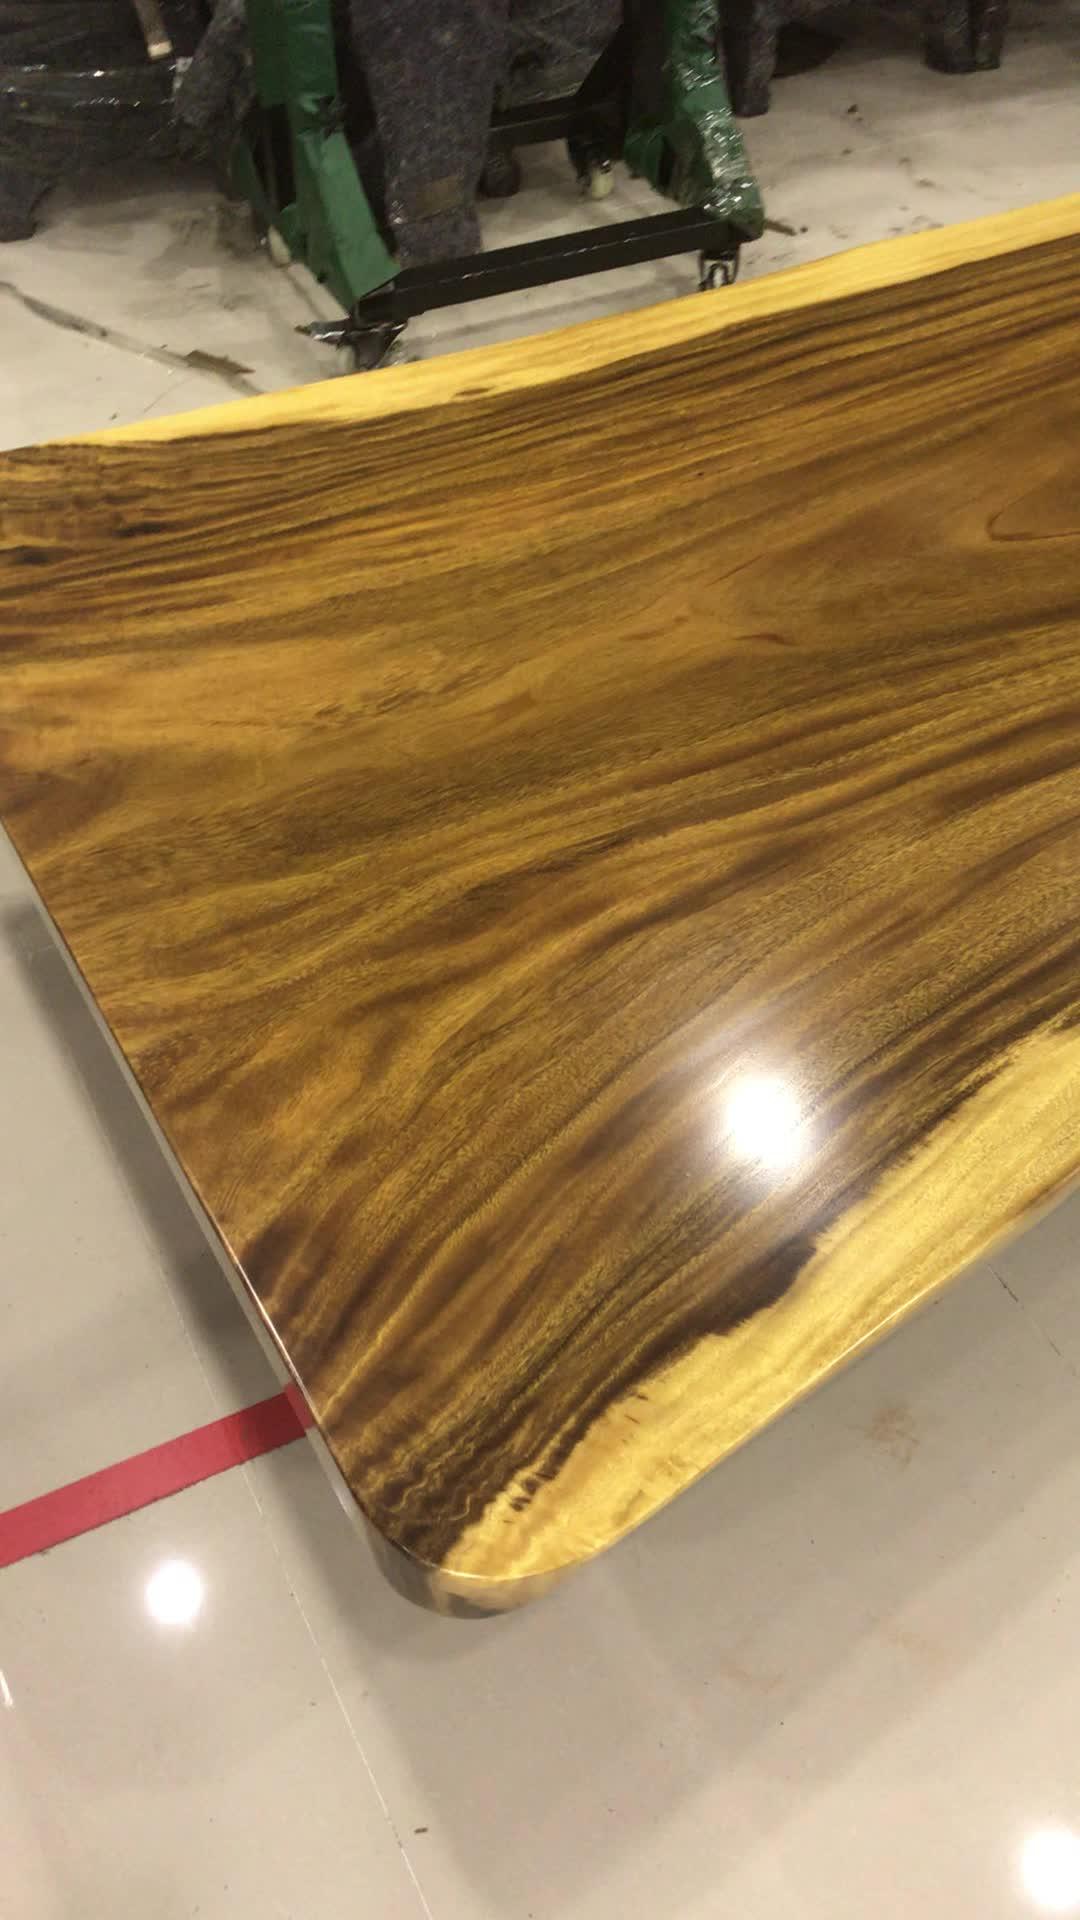 Live rand industrielle holz platte/acacia holz platte tisch top